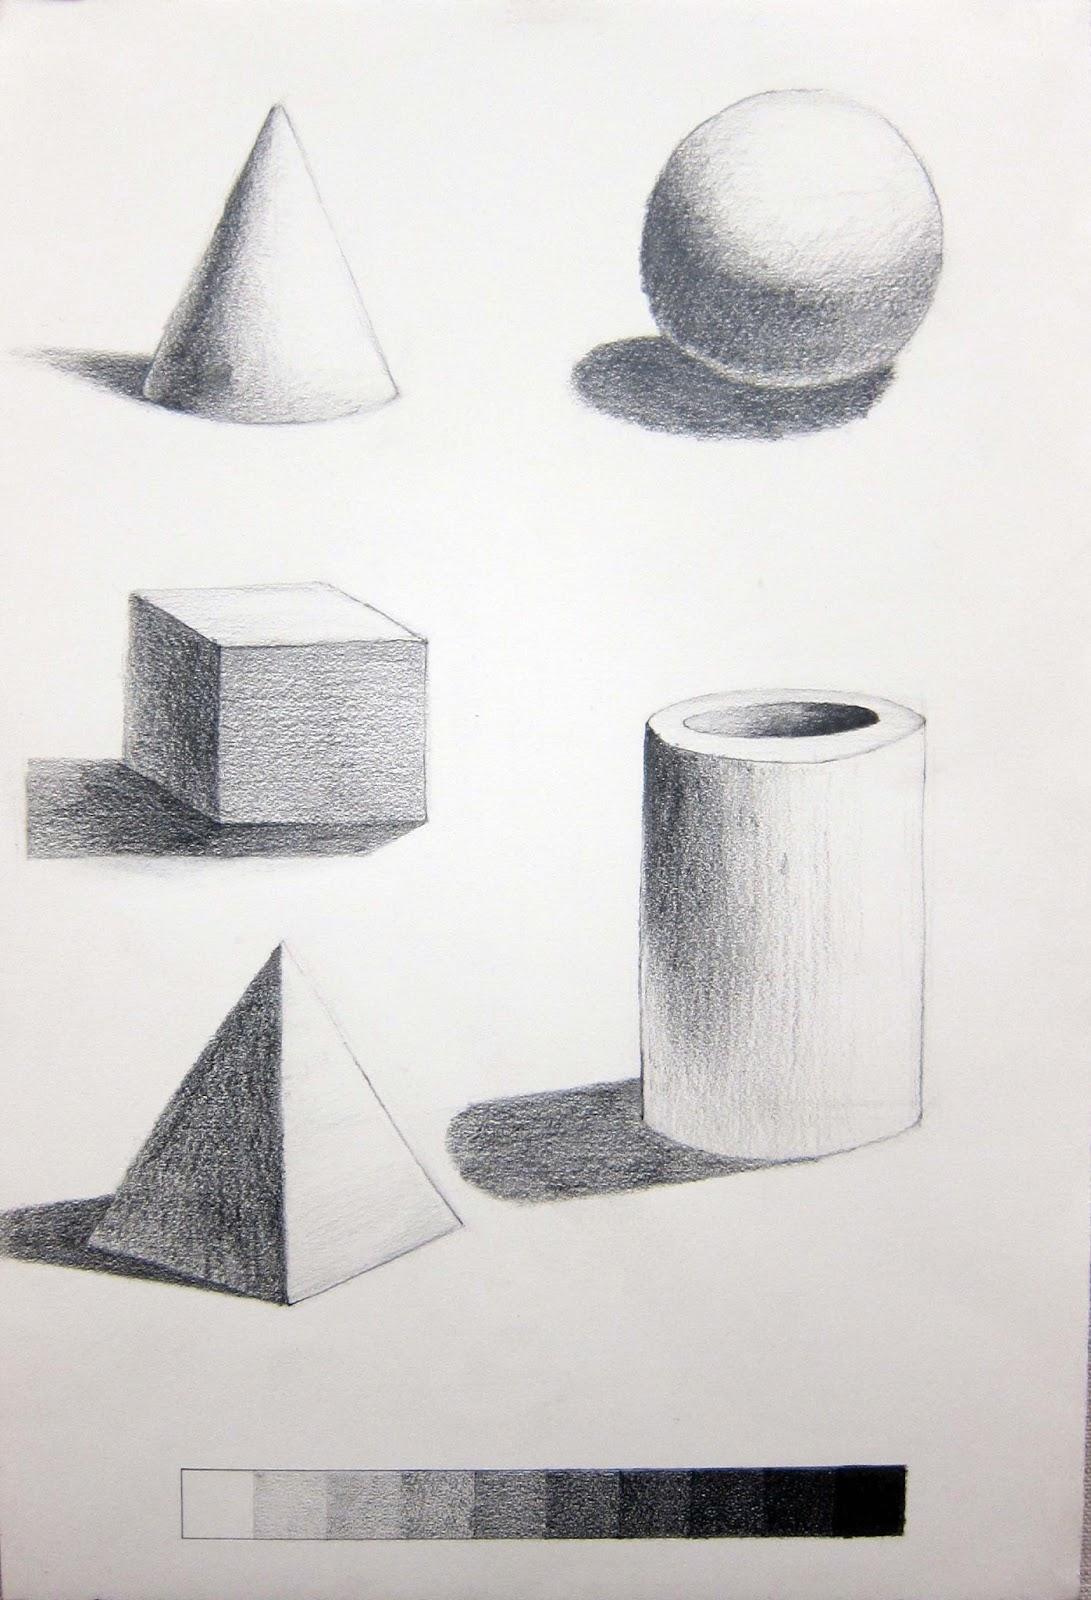 Drawn pyramid pencil Teach Composition William Beginning Drawing